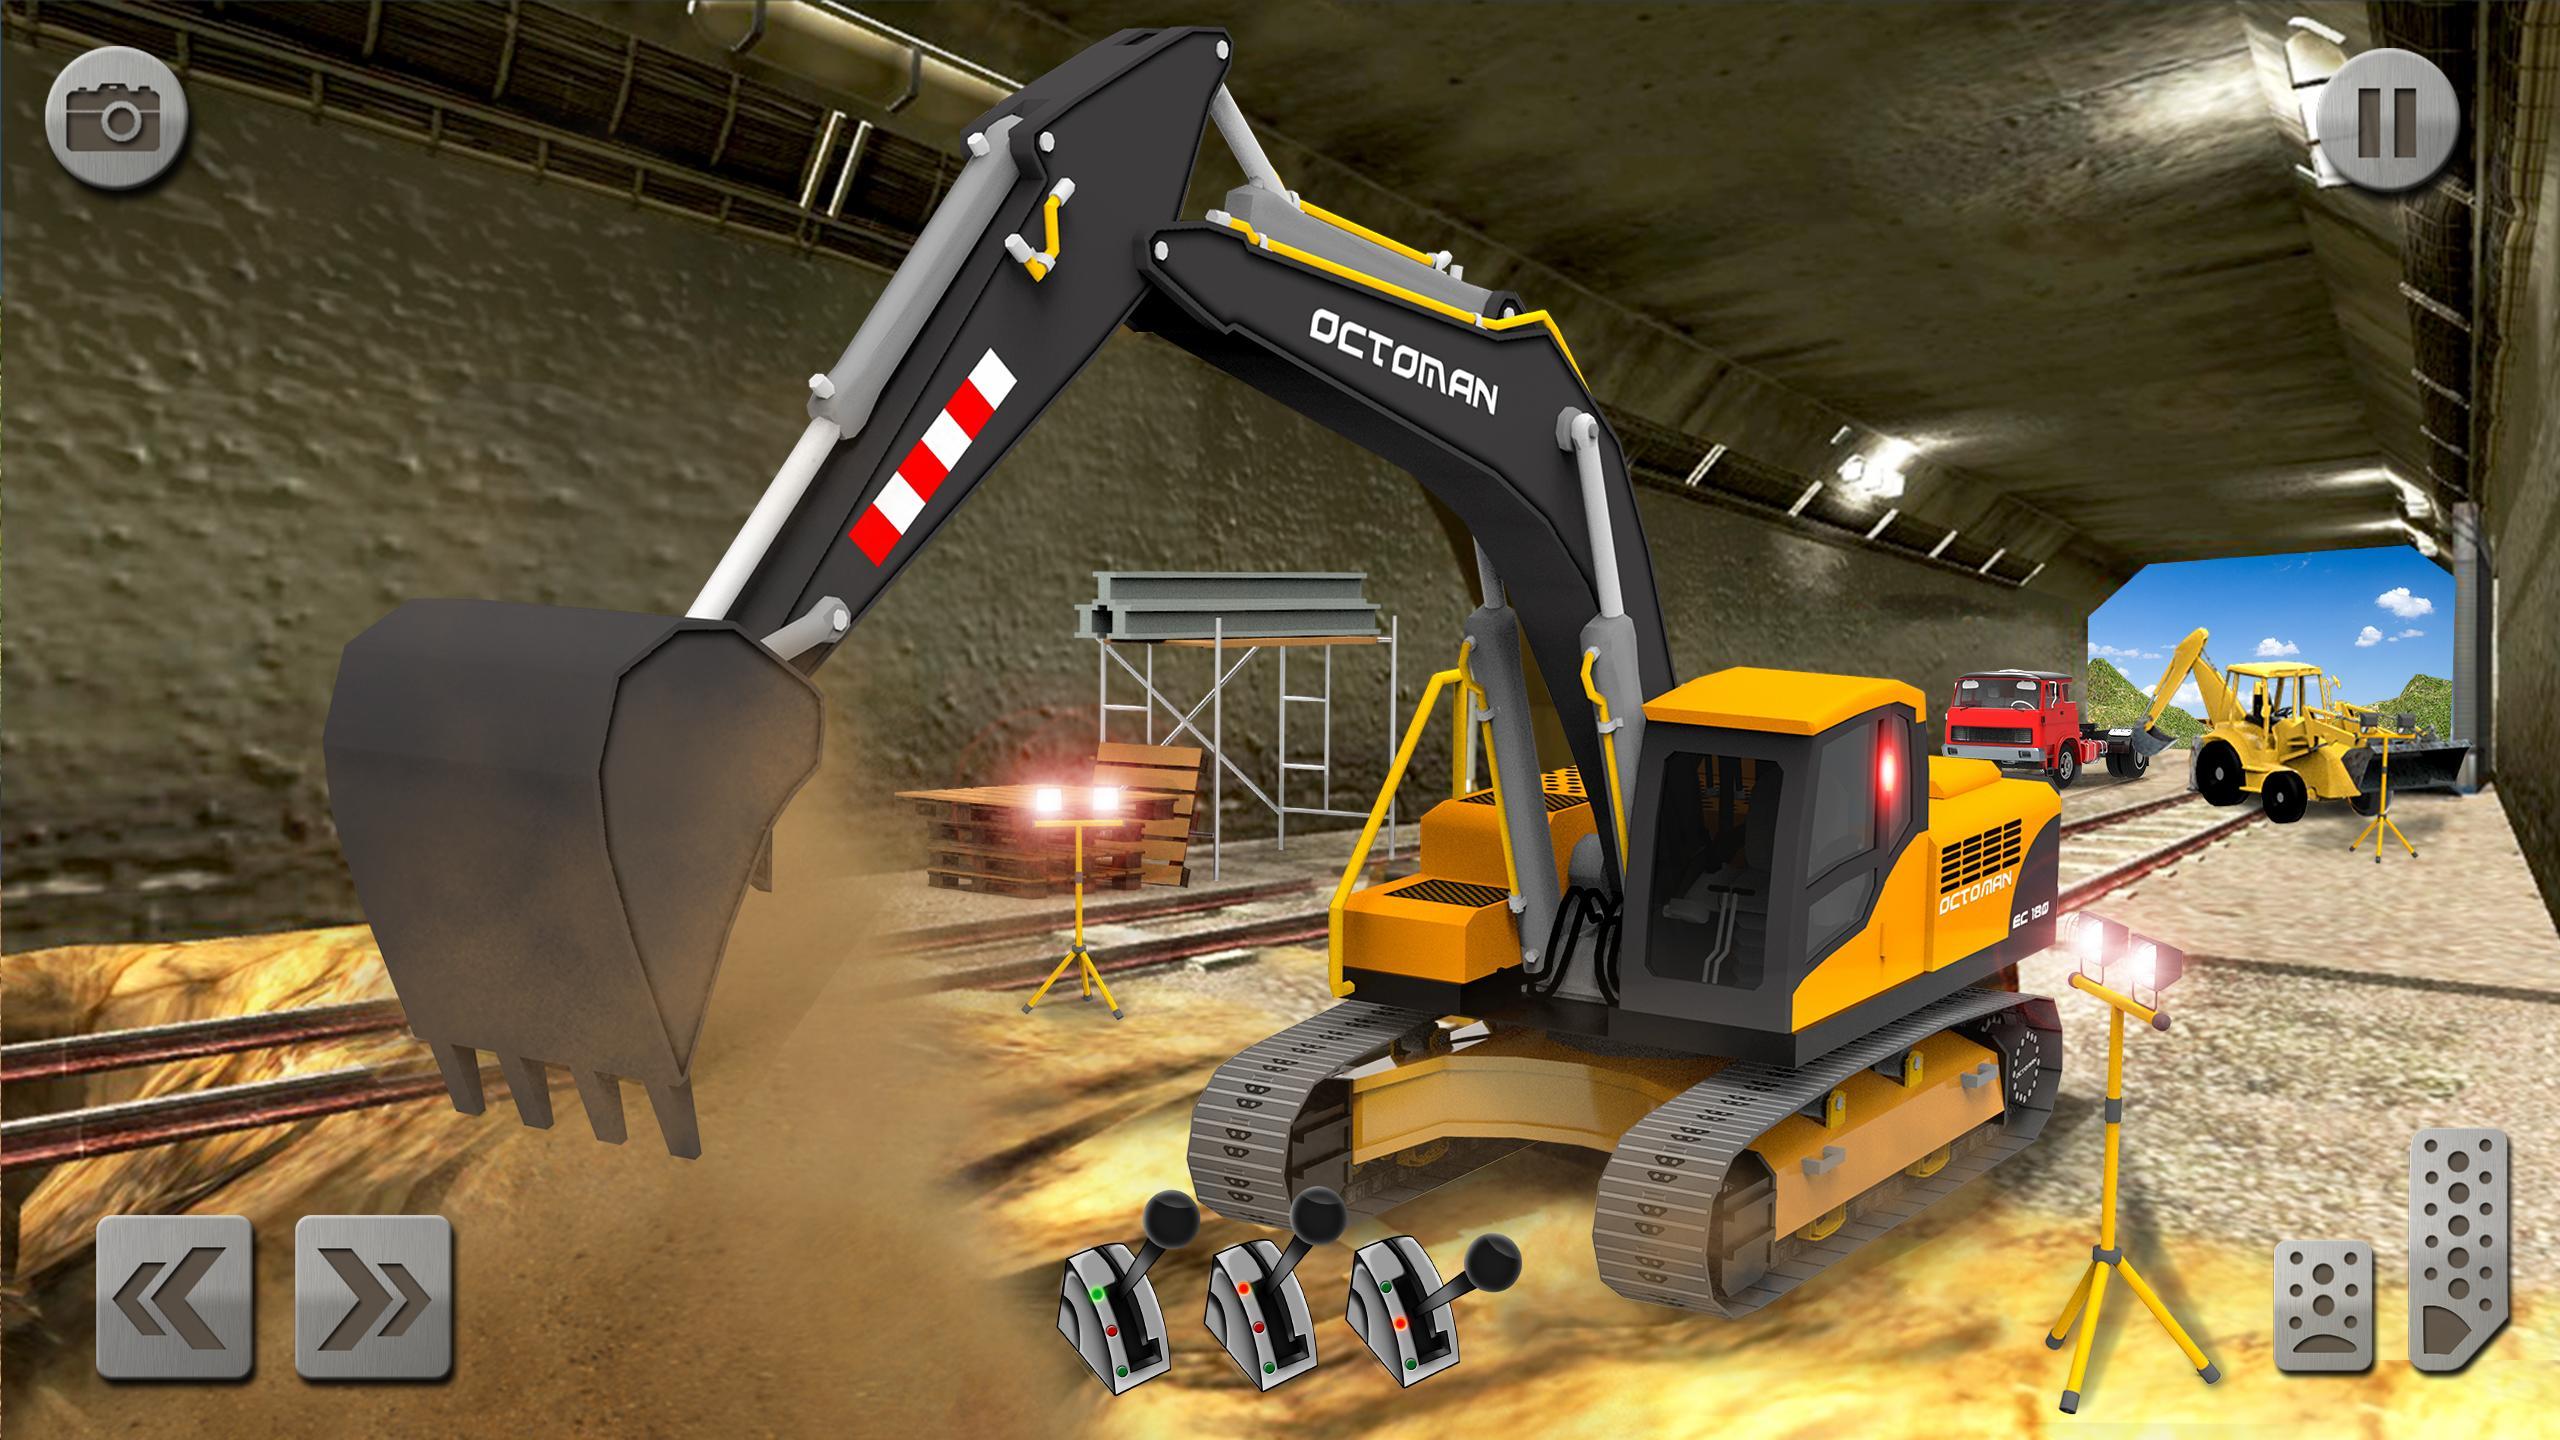 Sand Excavator Truck Driving Rescue Simulator game 5.2 Screenshot 24